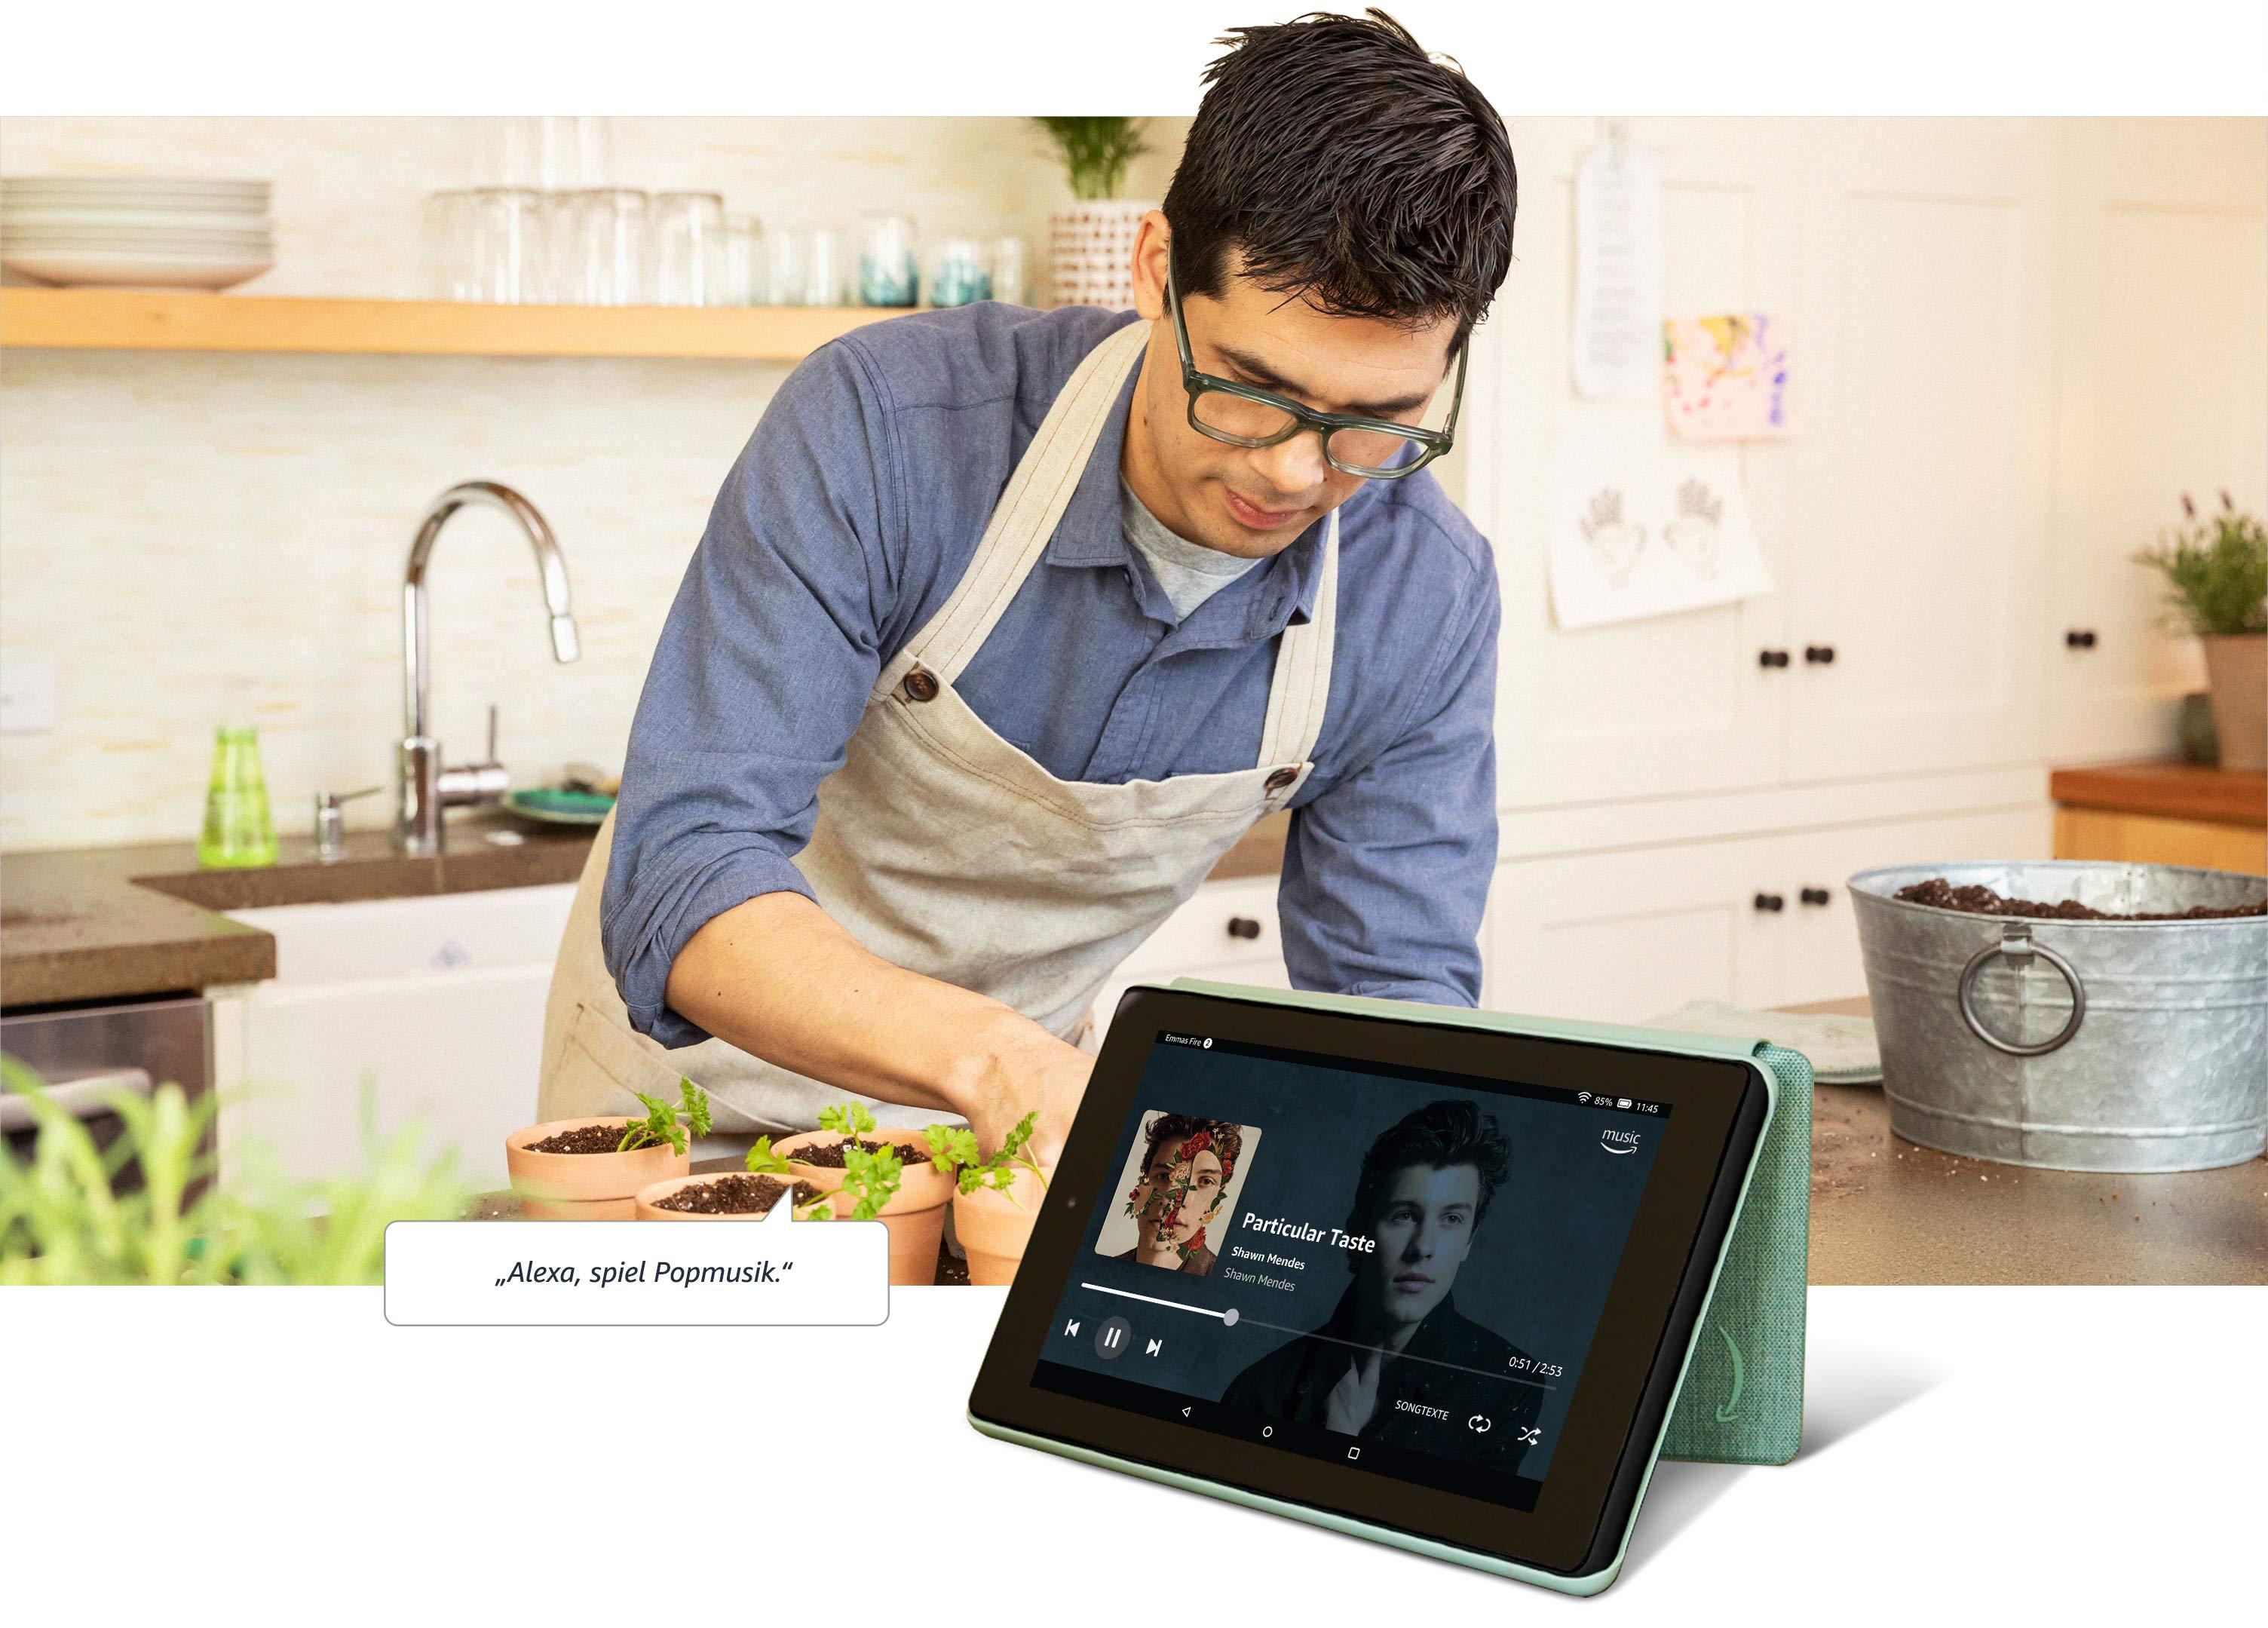 Fire 7 Tablet 7 Zoll Display 16 Gb Schwarz Mit Werbung Amazon Devices